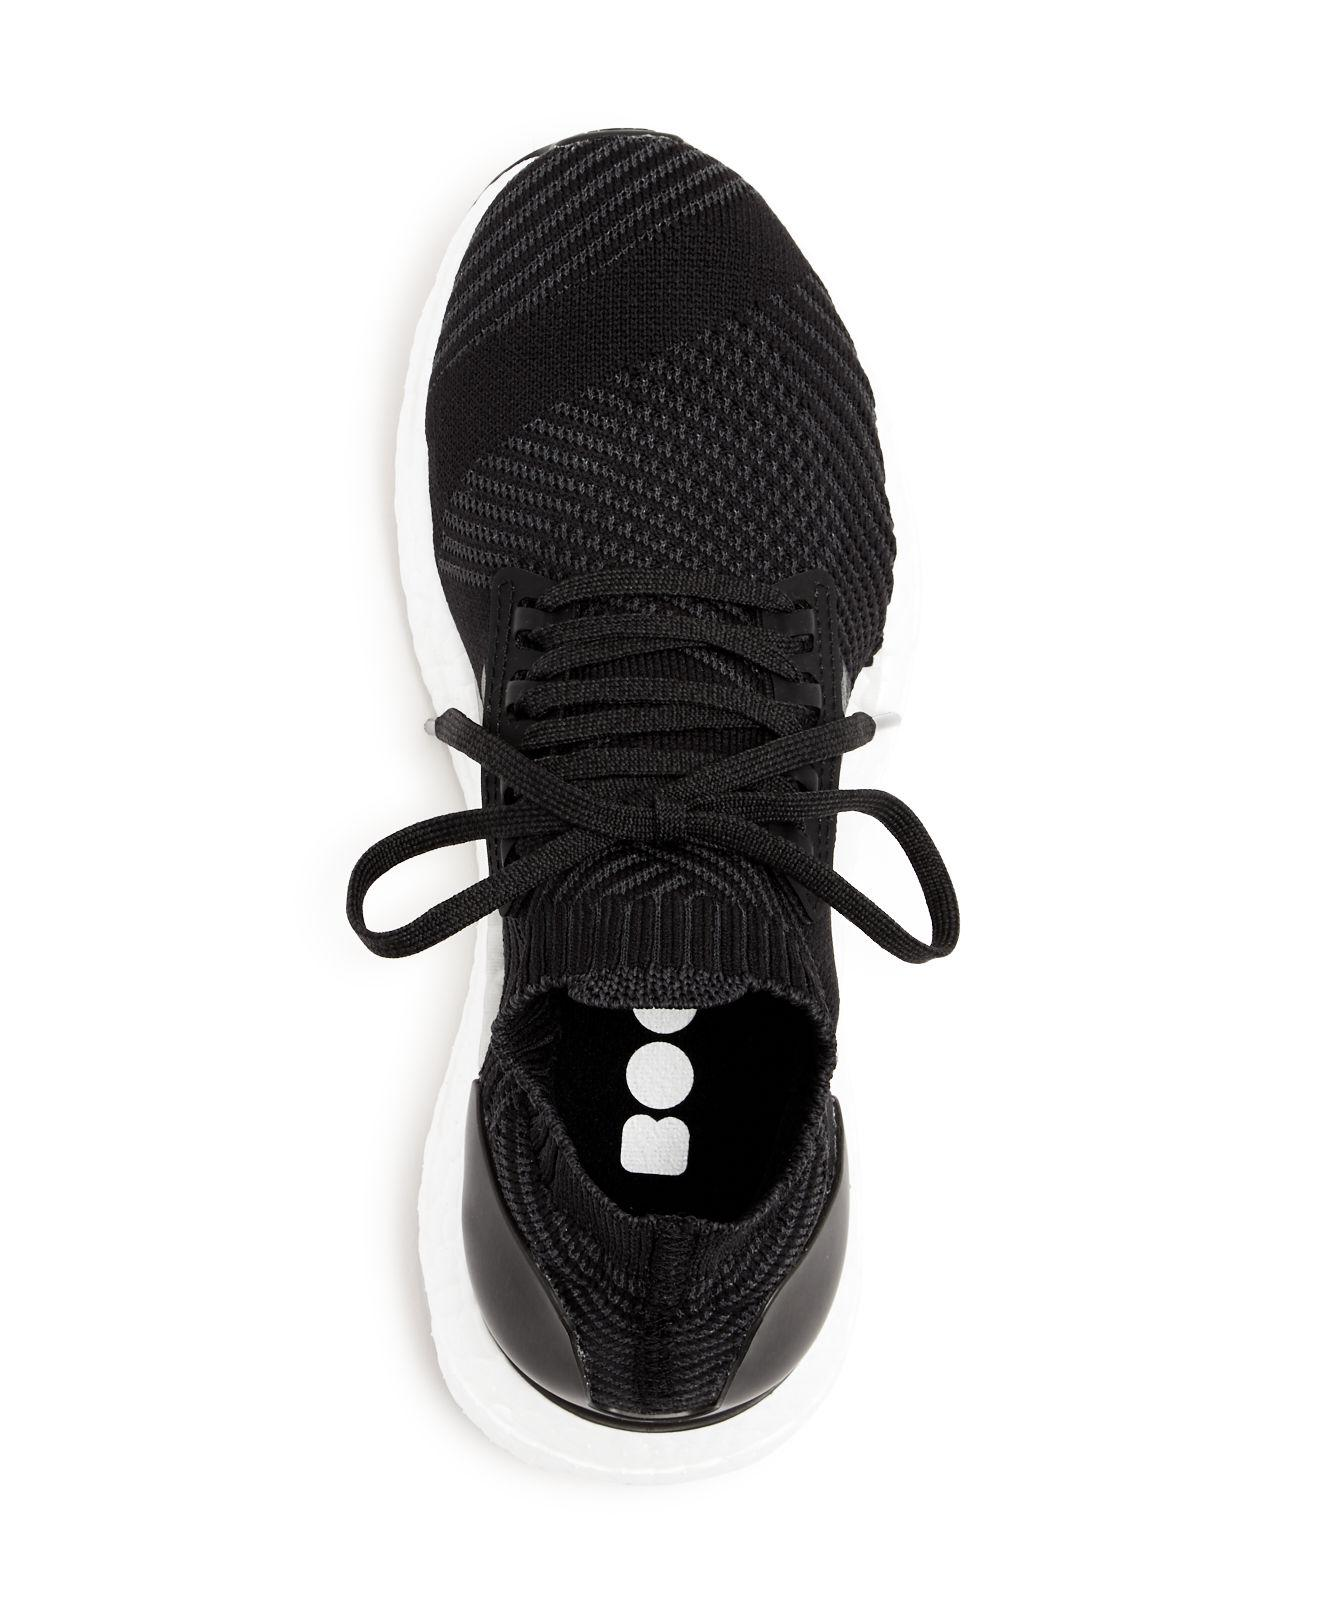 adidas Women's Ultraboost X Knit Lace Up Sneakers